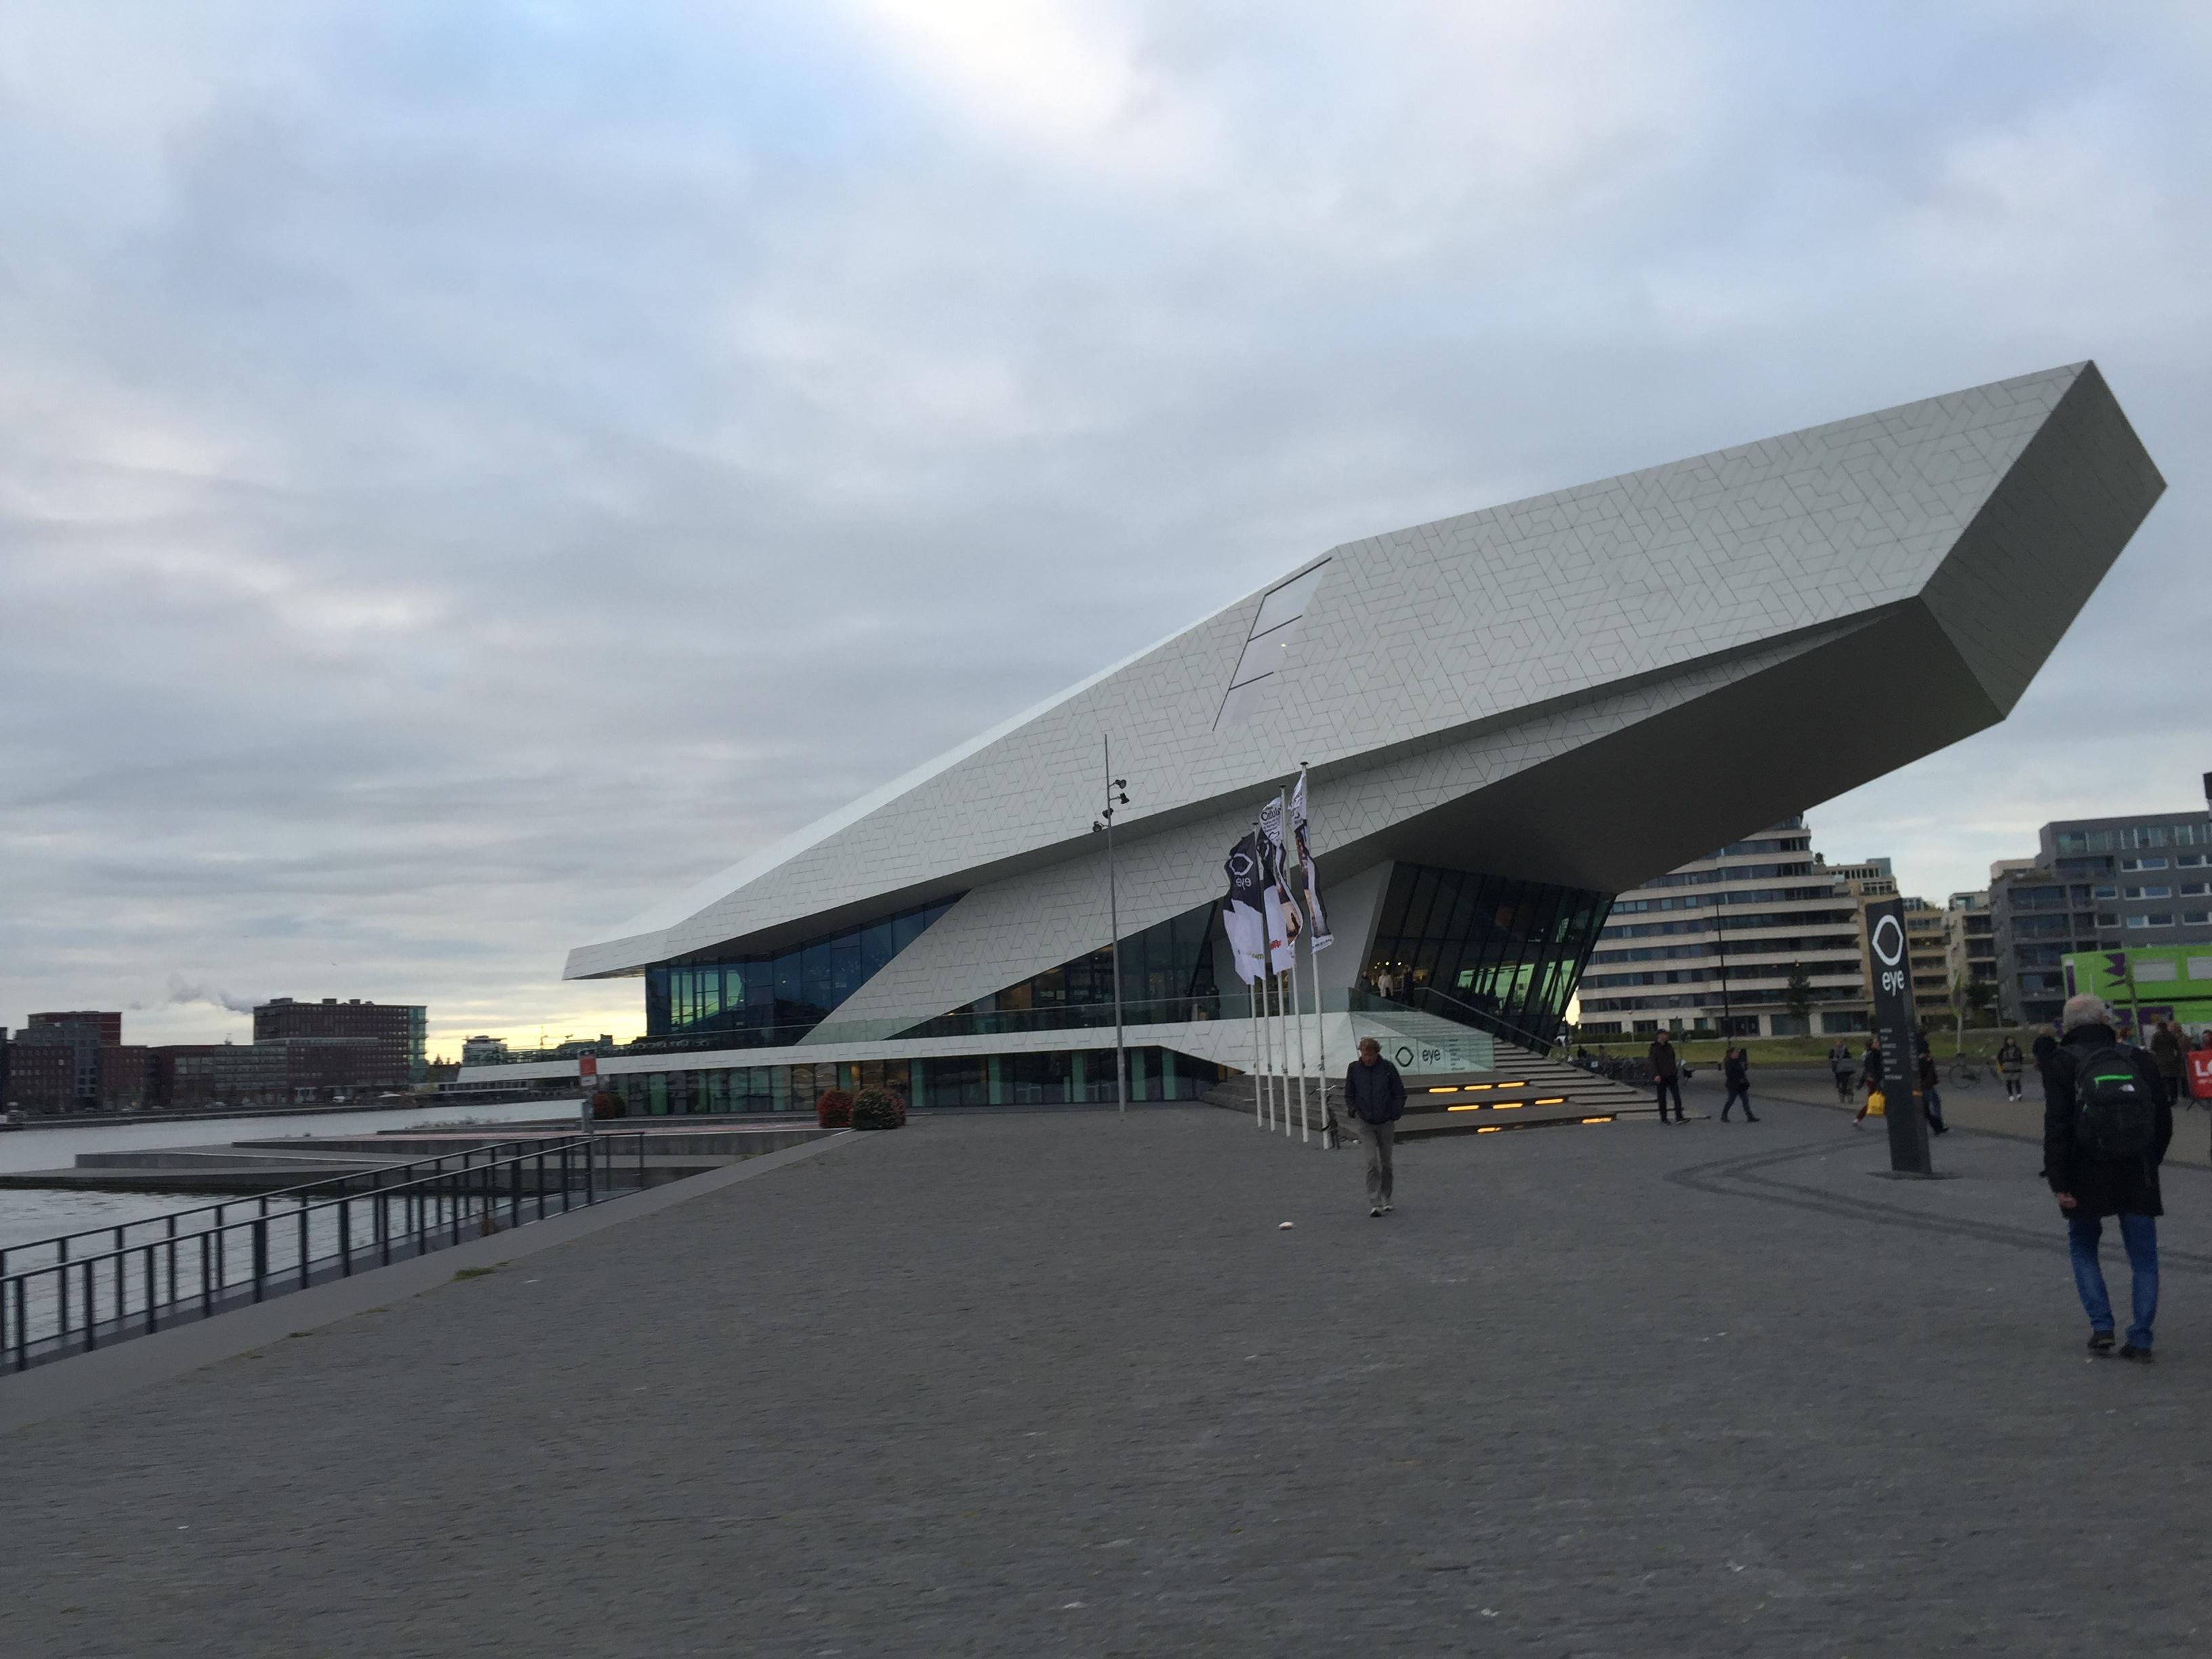 lookout-balanca-mais-alta-europa-amsterdam-21